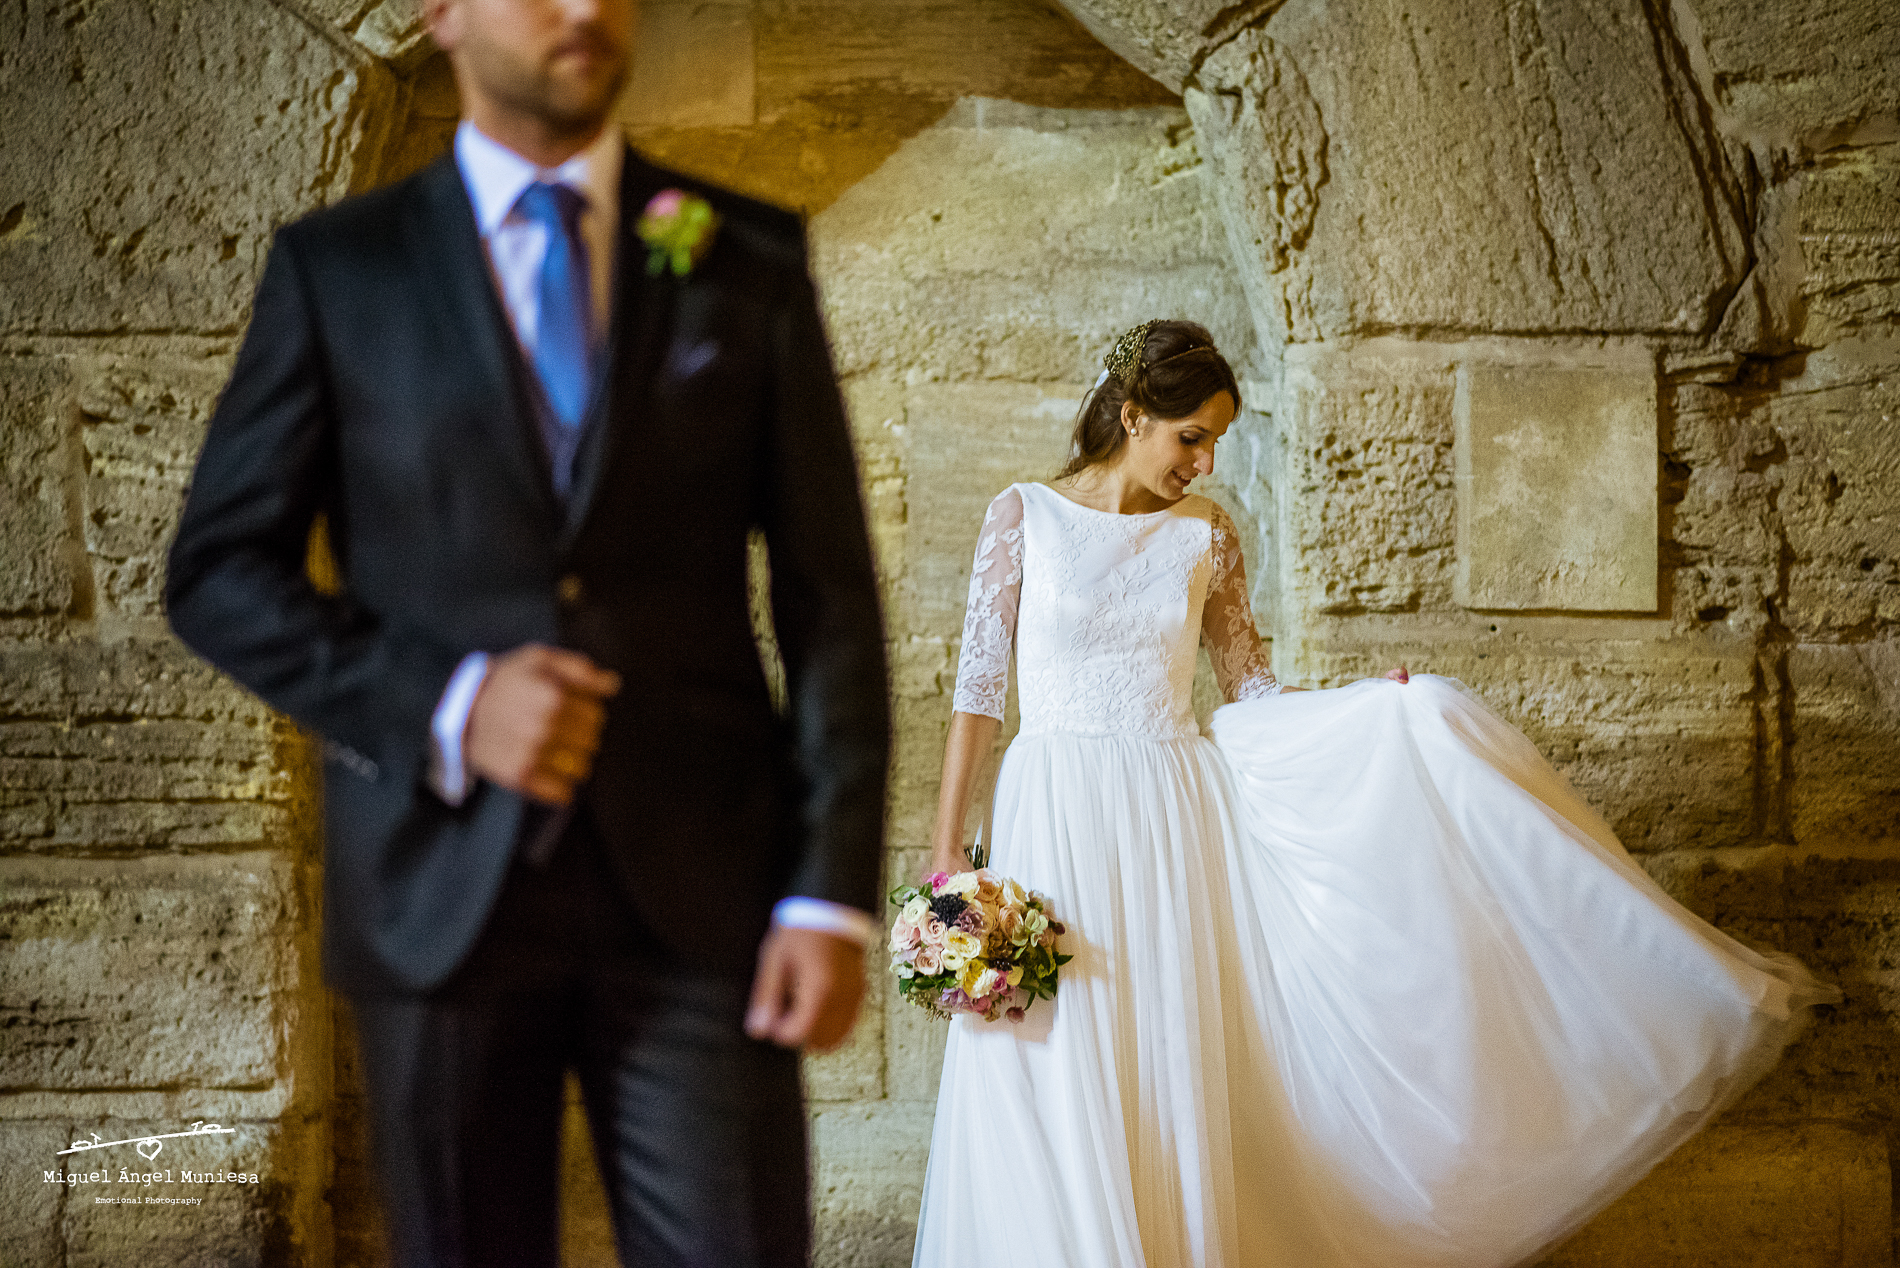 miguel angel muniesa, fotografo boda Teruel, fotografo boda navarra, fotografo boda zaragoza, fotografo boda soria, miguel angel muniesa emotional photography_16